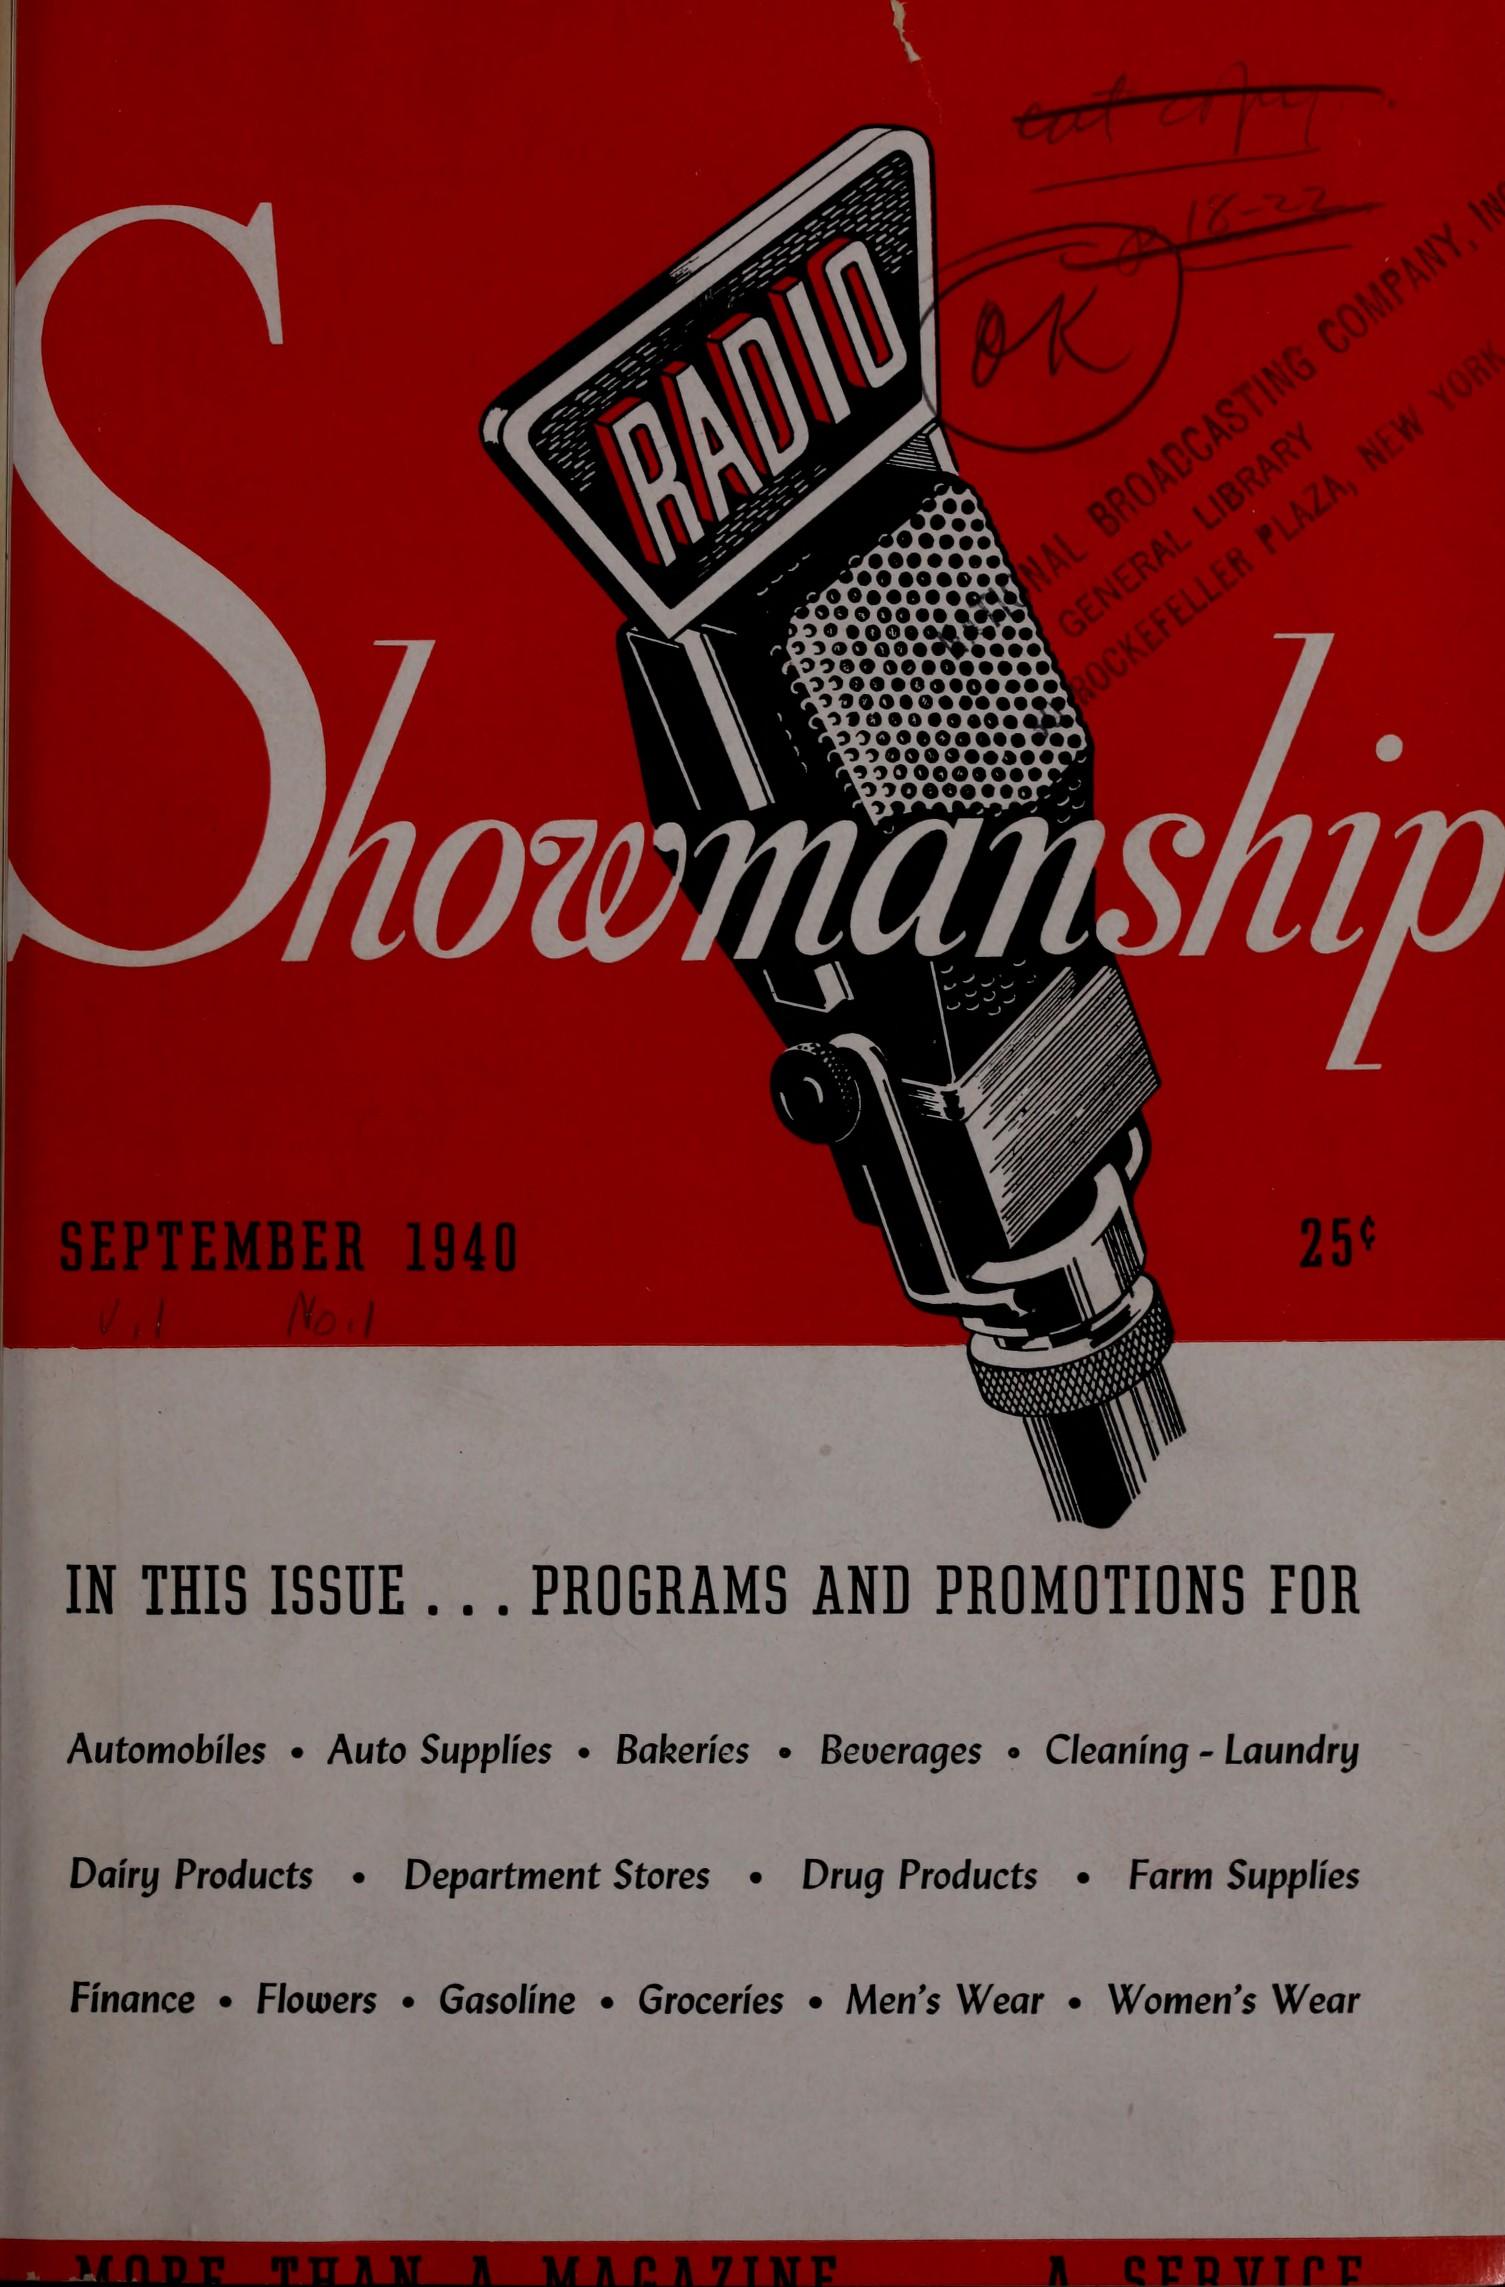 Radioshowmanship01radi_jp2.zip&file=radioshowmanship01radi_jp2%2fradioshowmanship01radi_0007